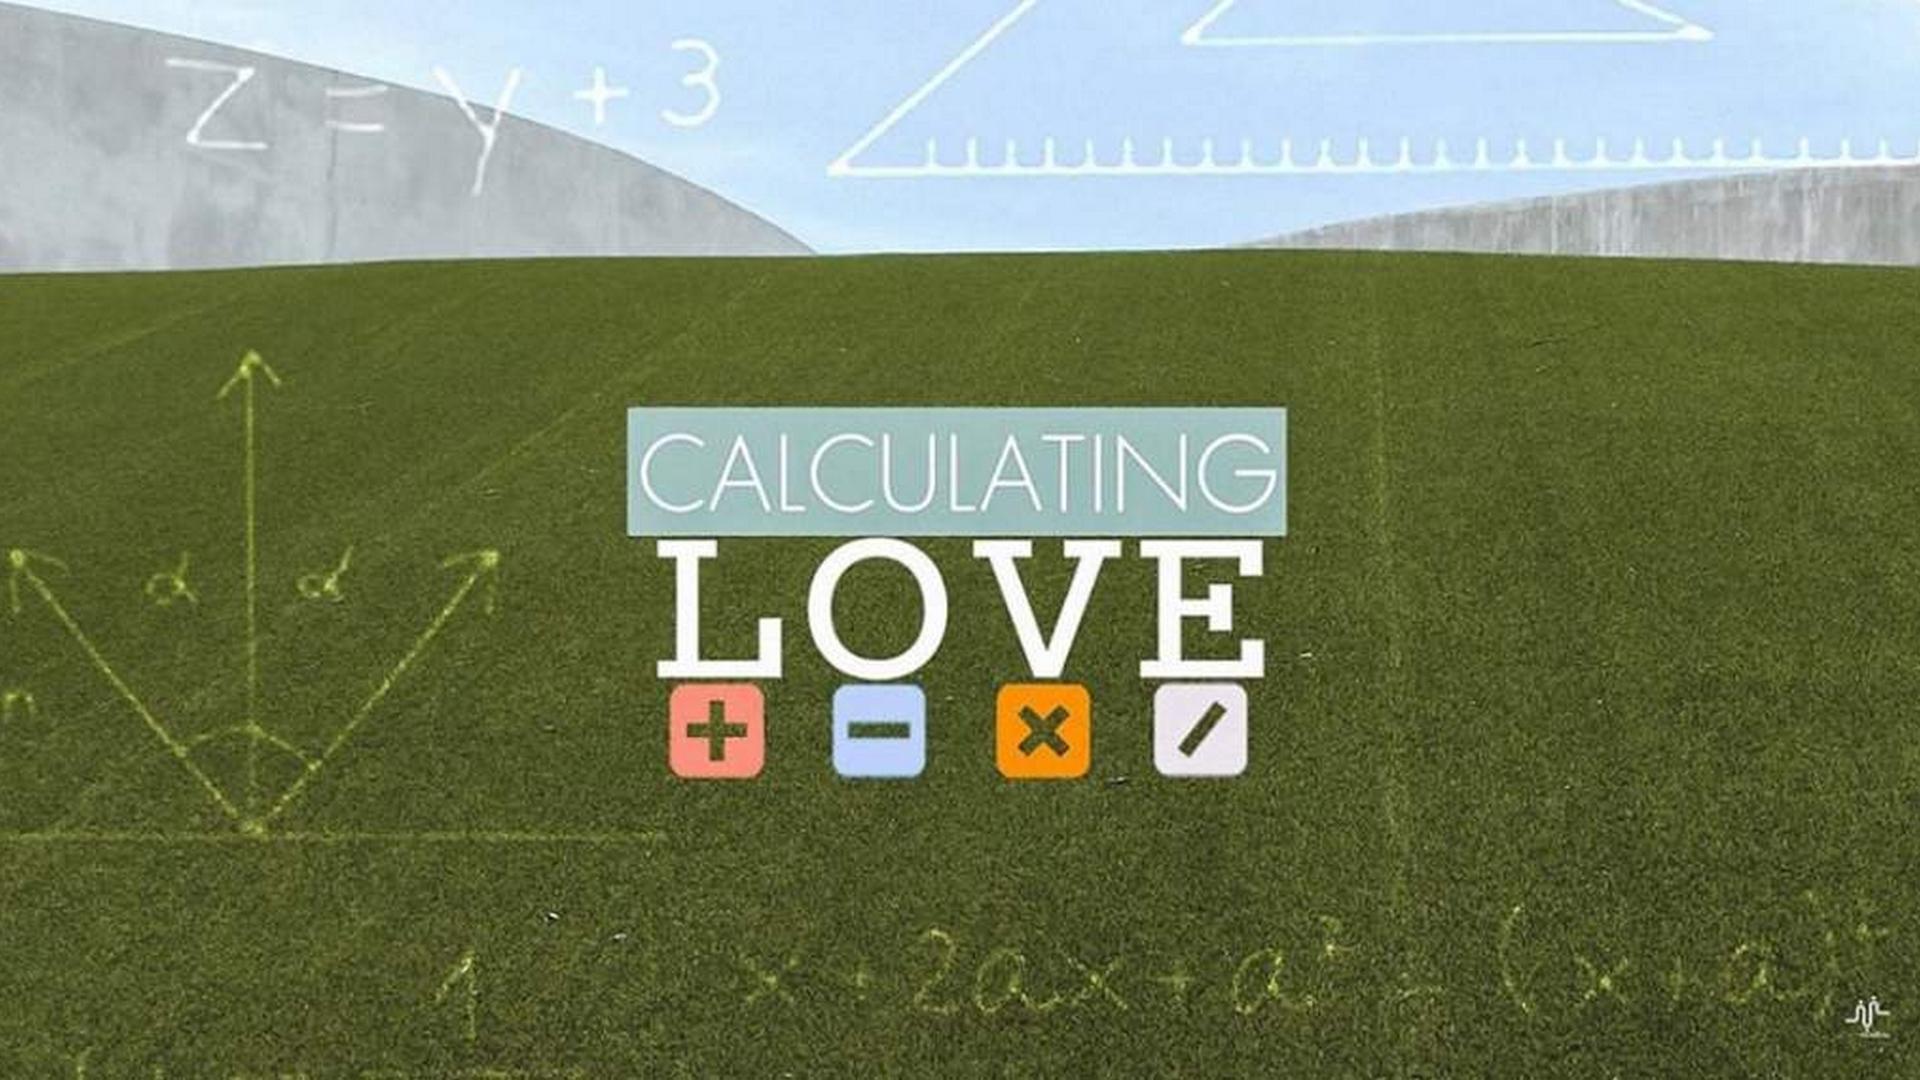 Calculating Love